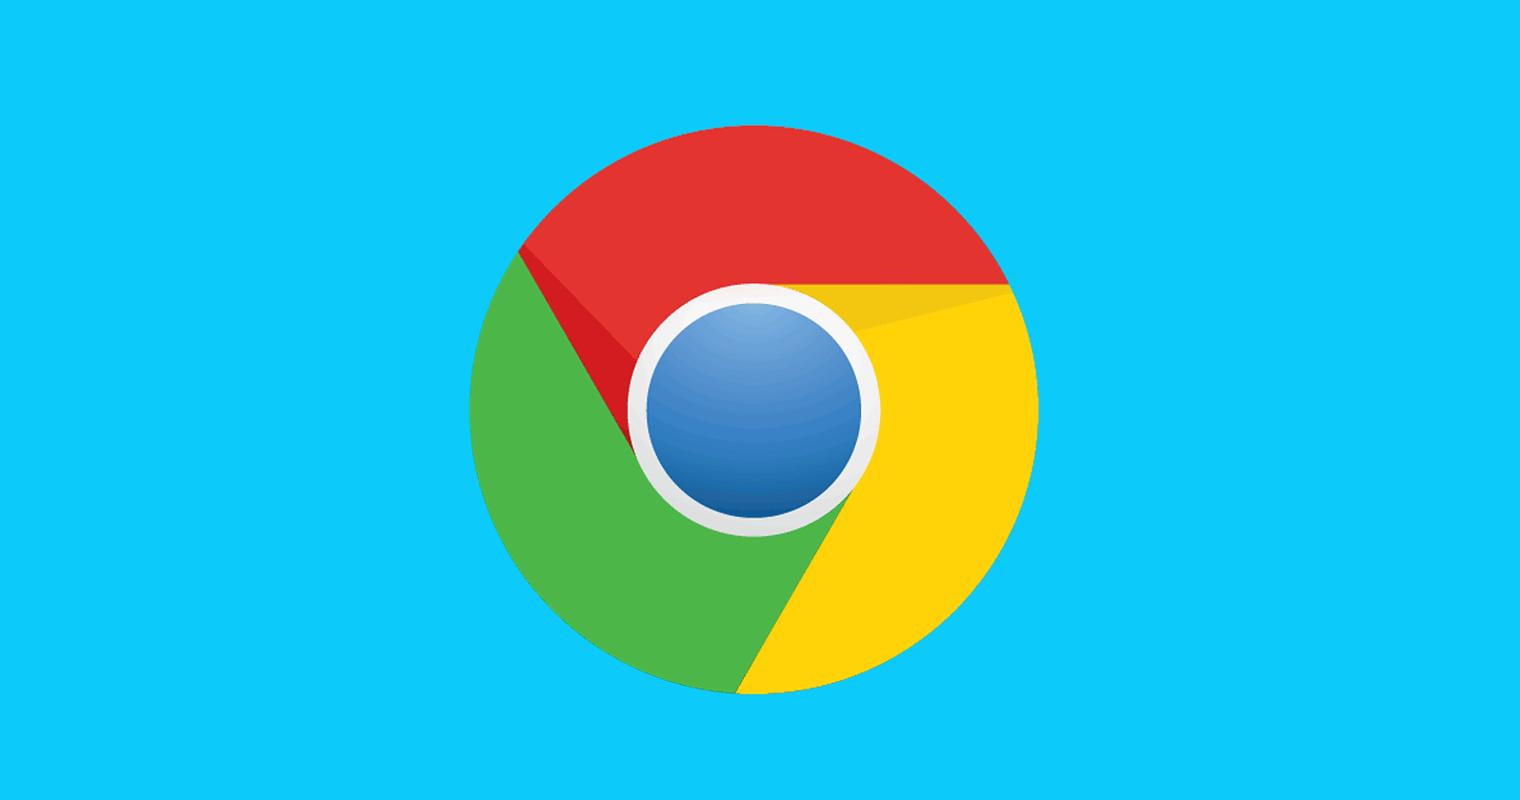 Google Chrome 86 Dev Tools Update